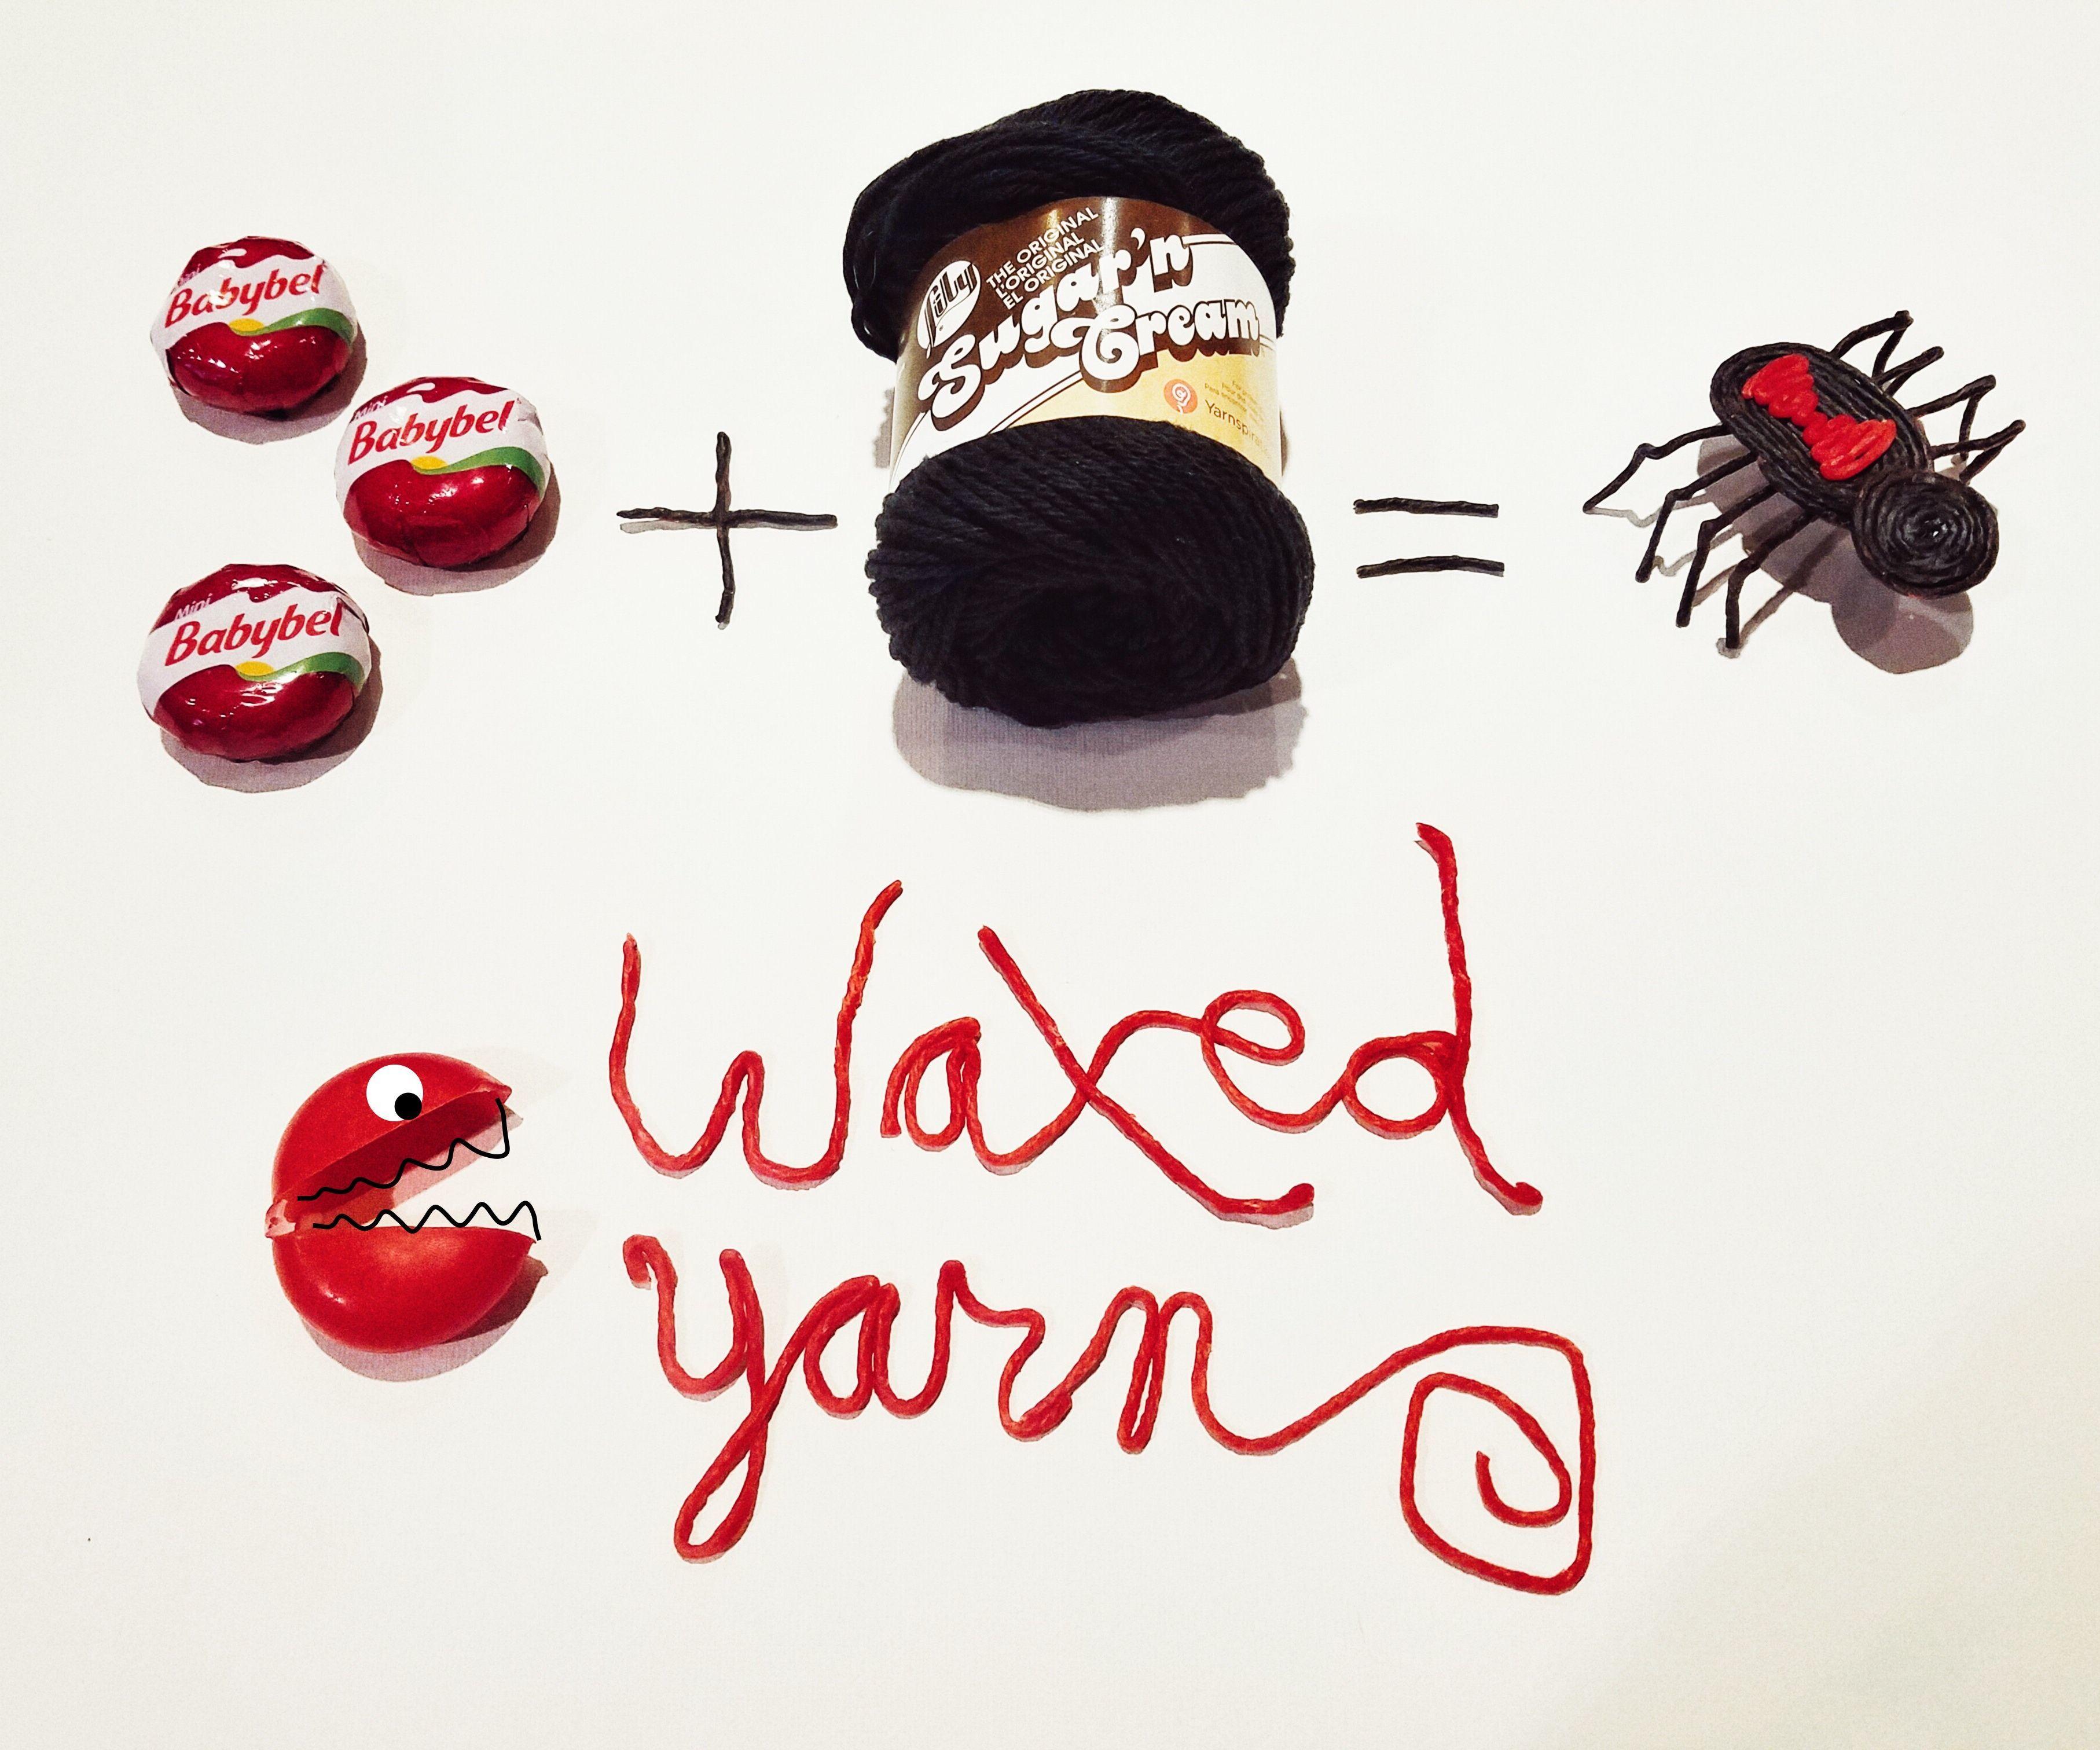 Posable Waxed Yarn Toy